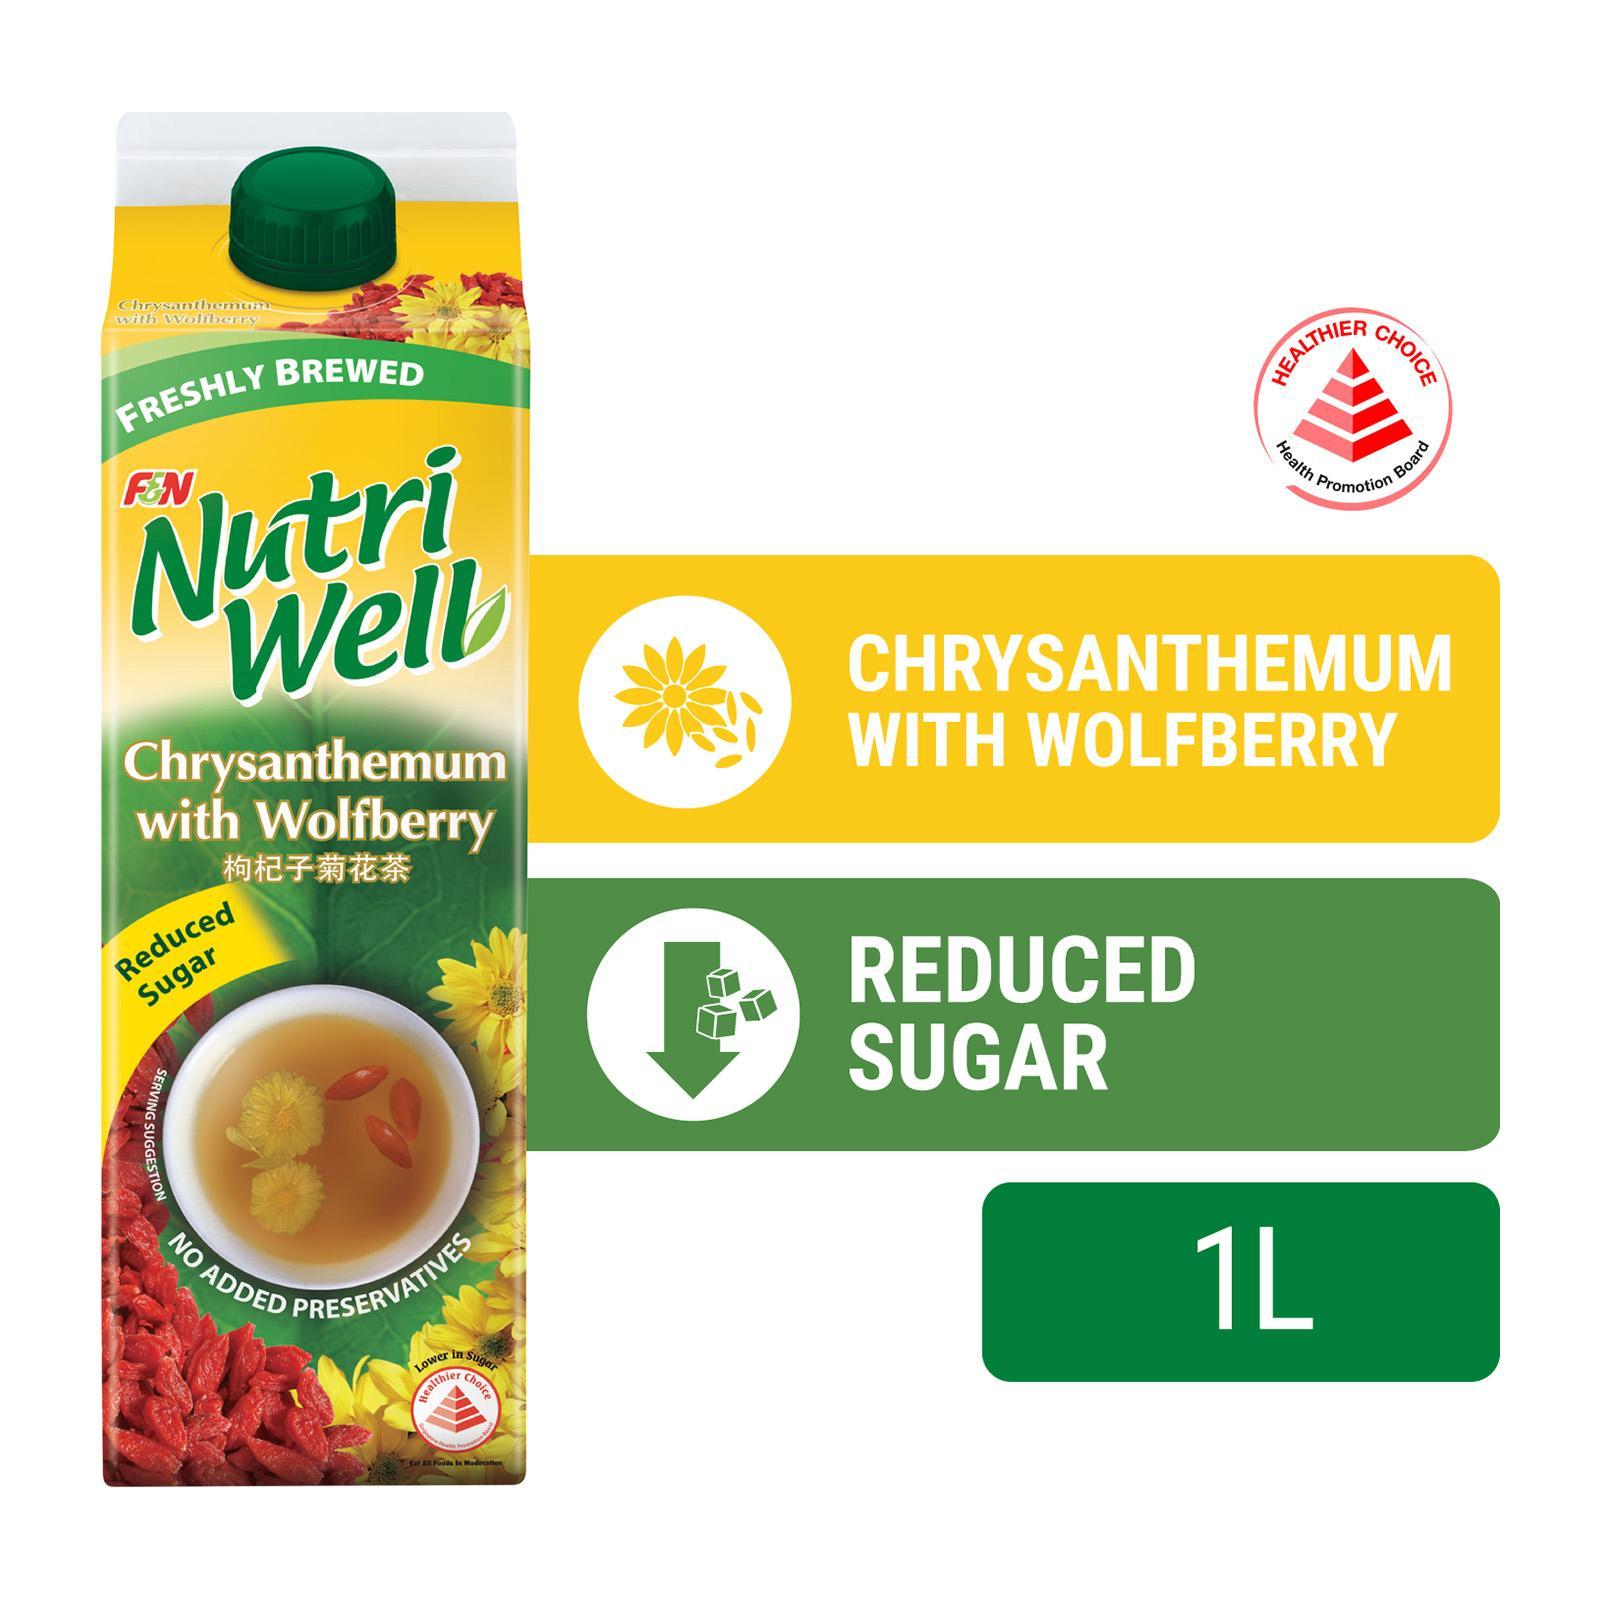 NUTRIWELL Chrysanthemum W/ Wolfberry 1L